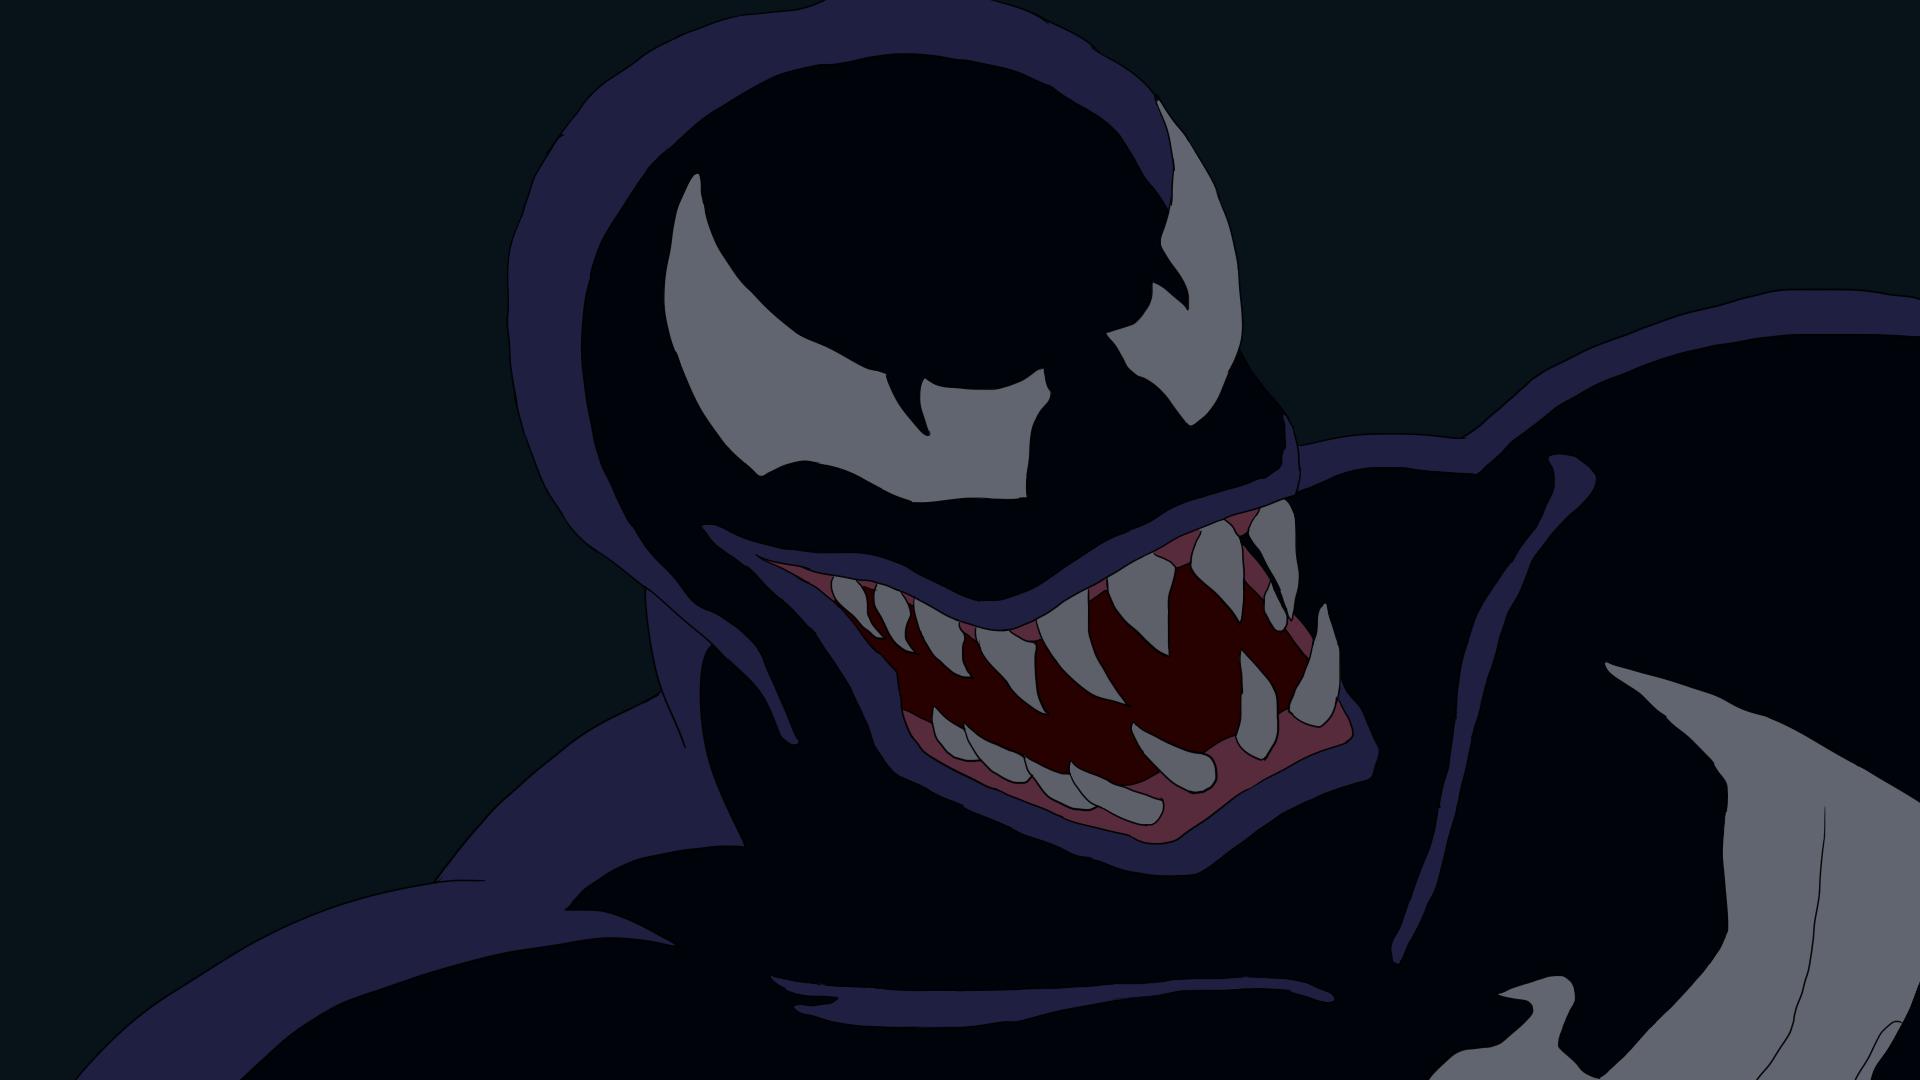 spiderman logo iphone 6 wallpaper